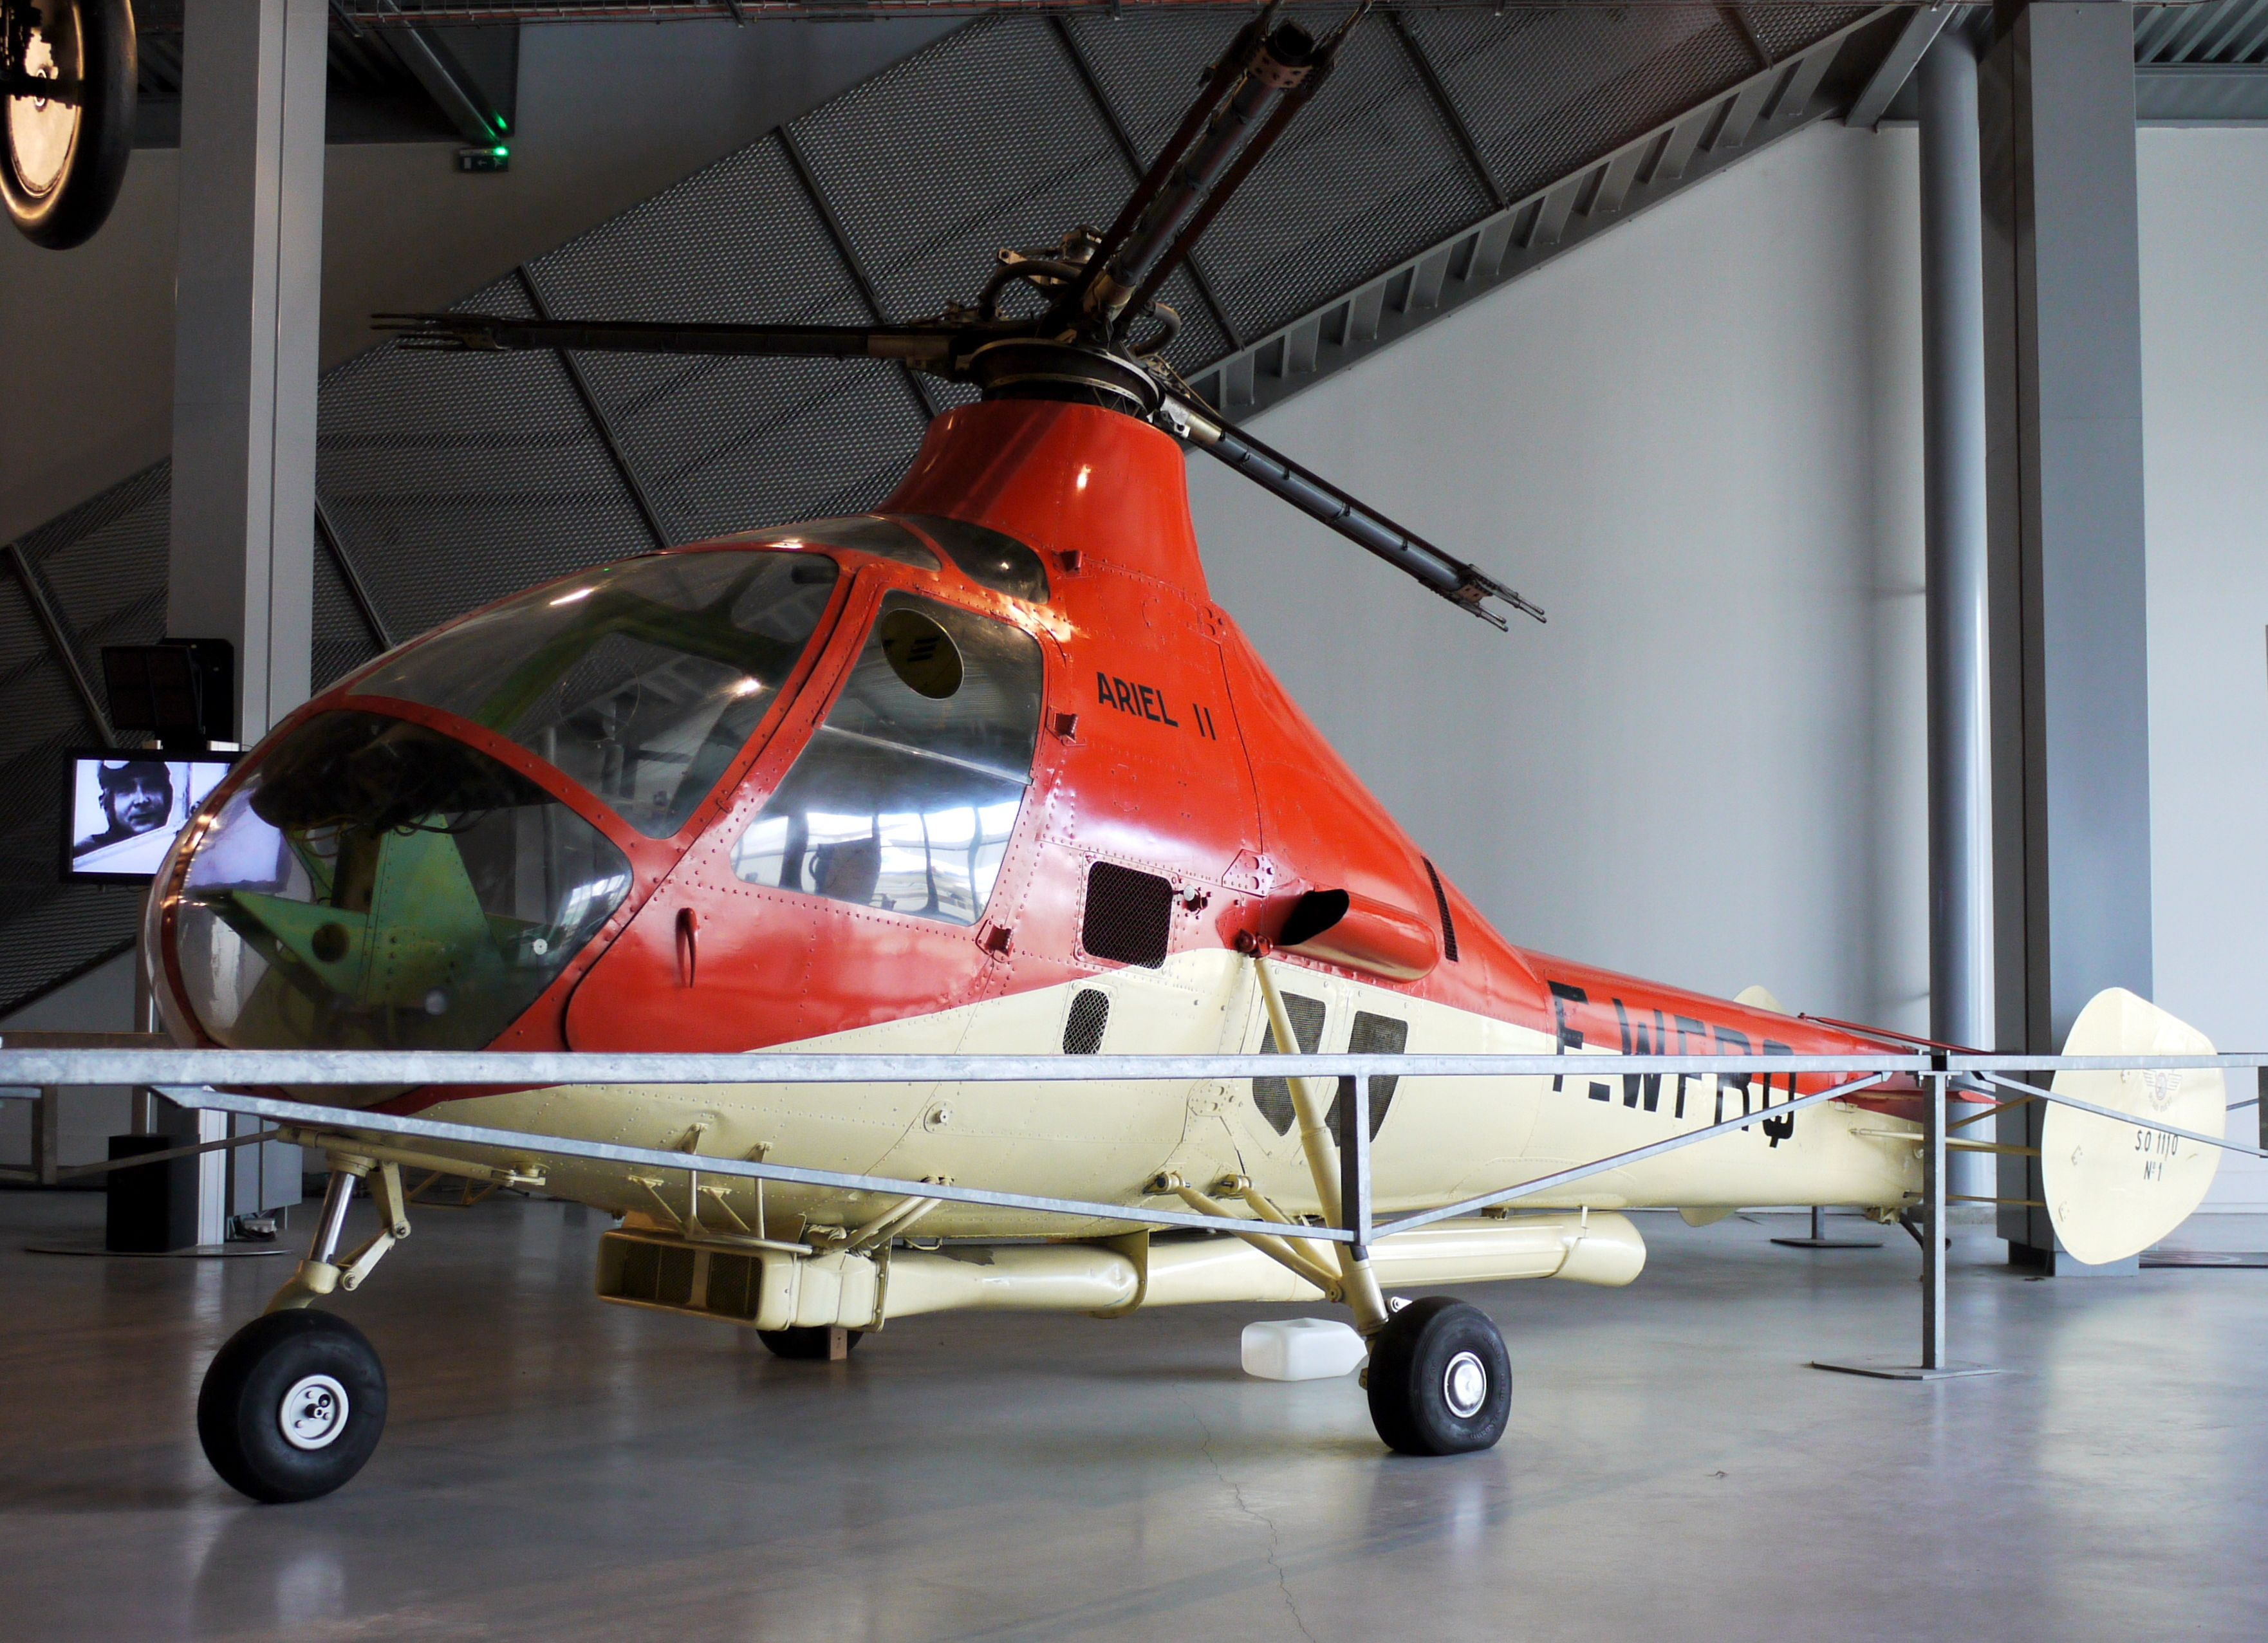 Ariel Aviation